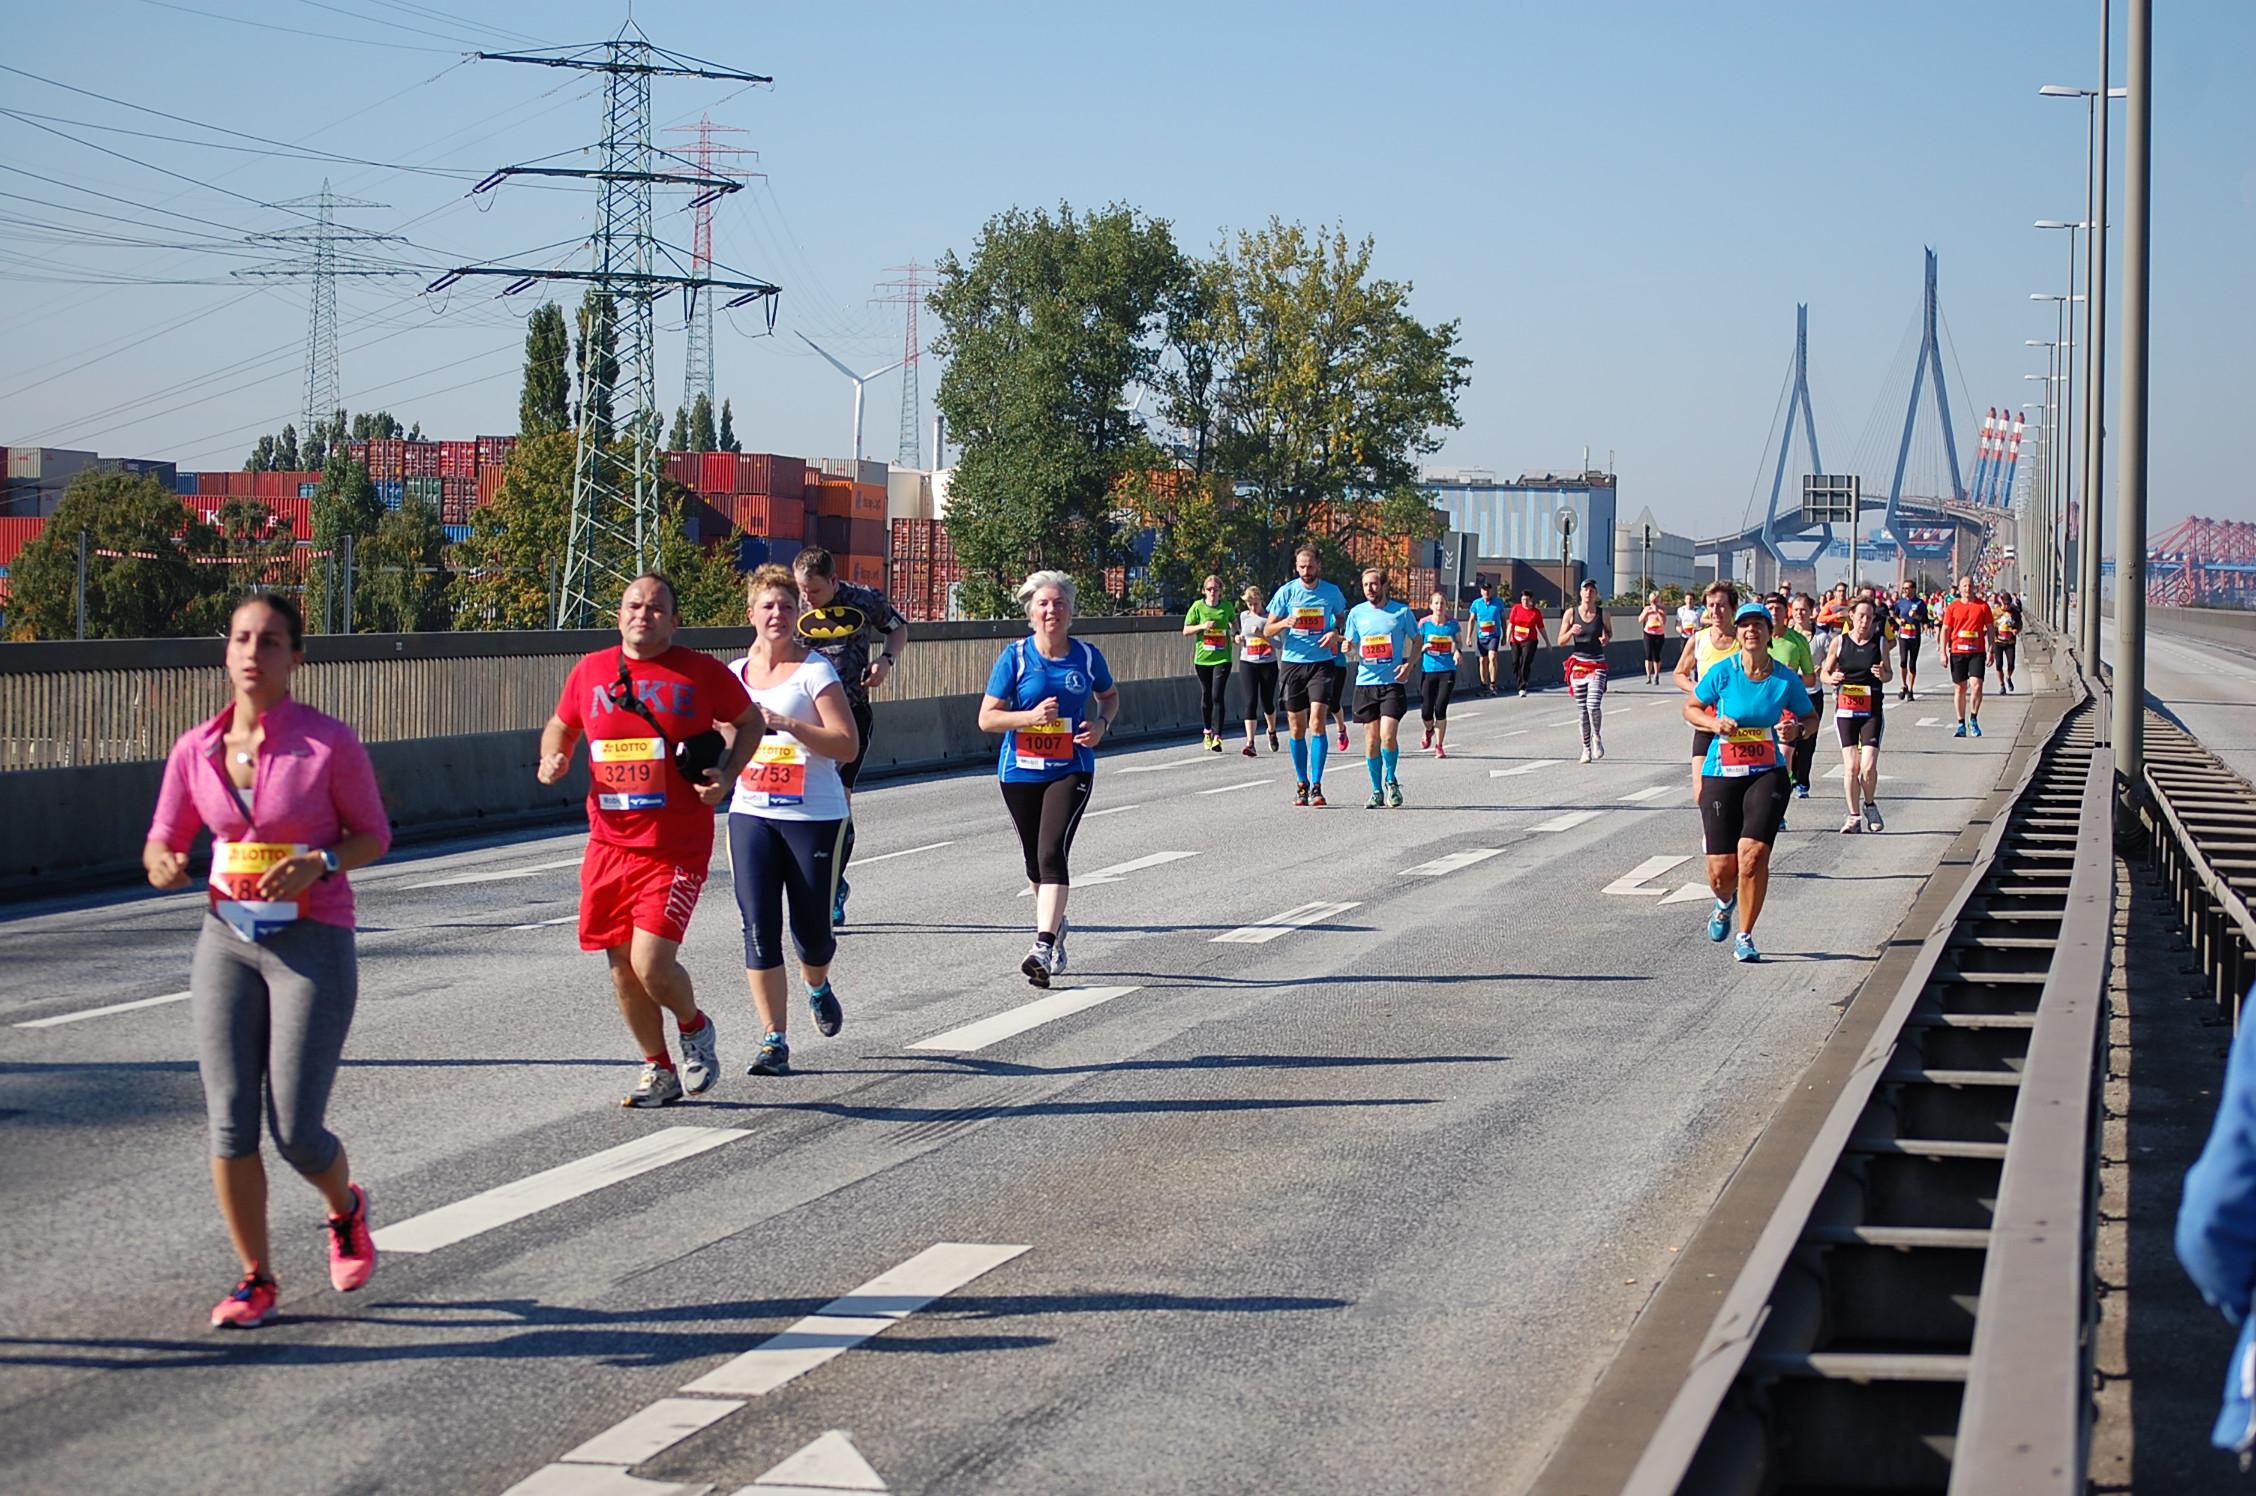 5. Köhlbrandbrückenlauf: Läufer bei km 9,5 (Ende der Brückenrampe)